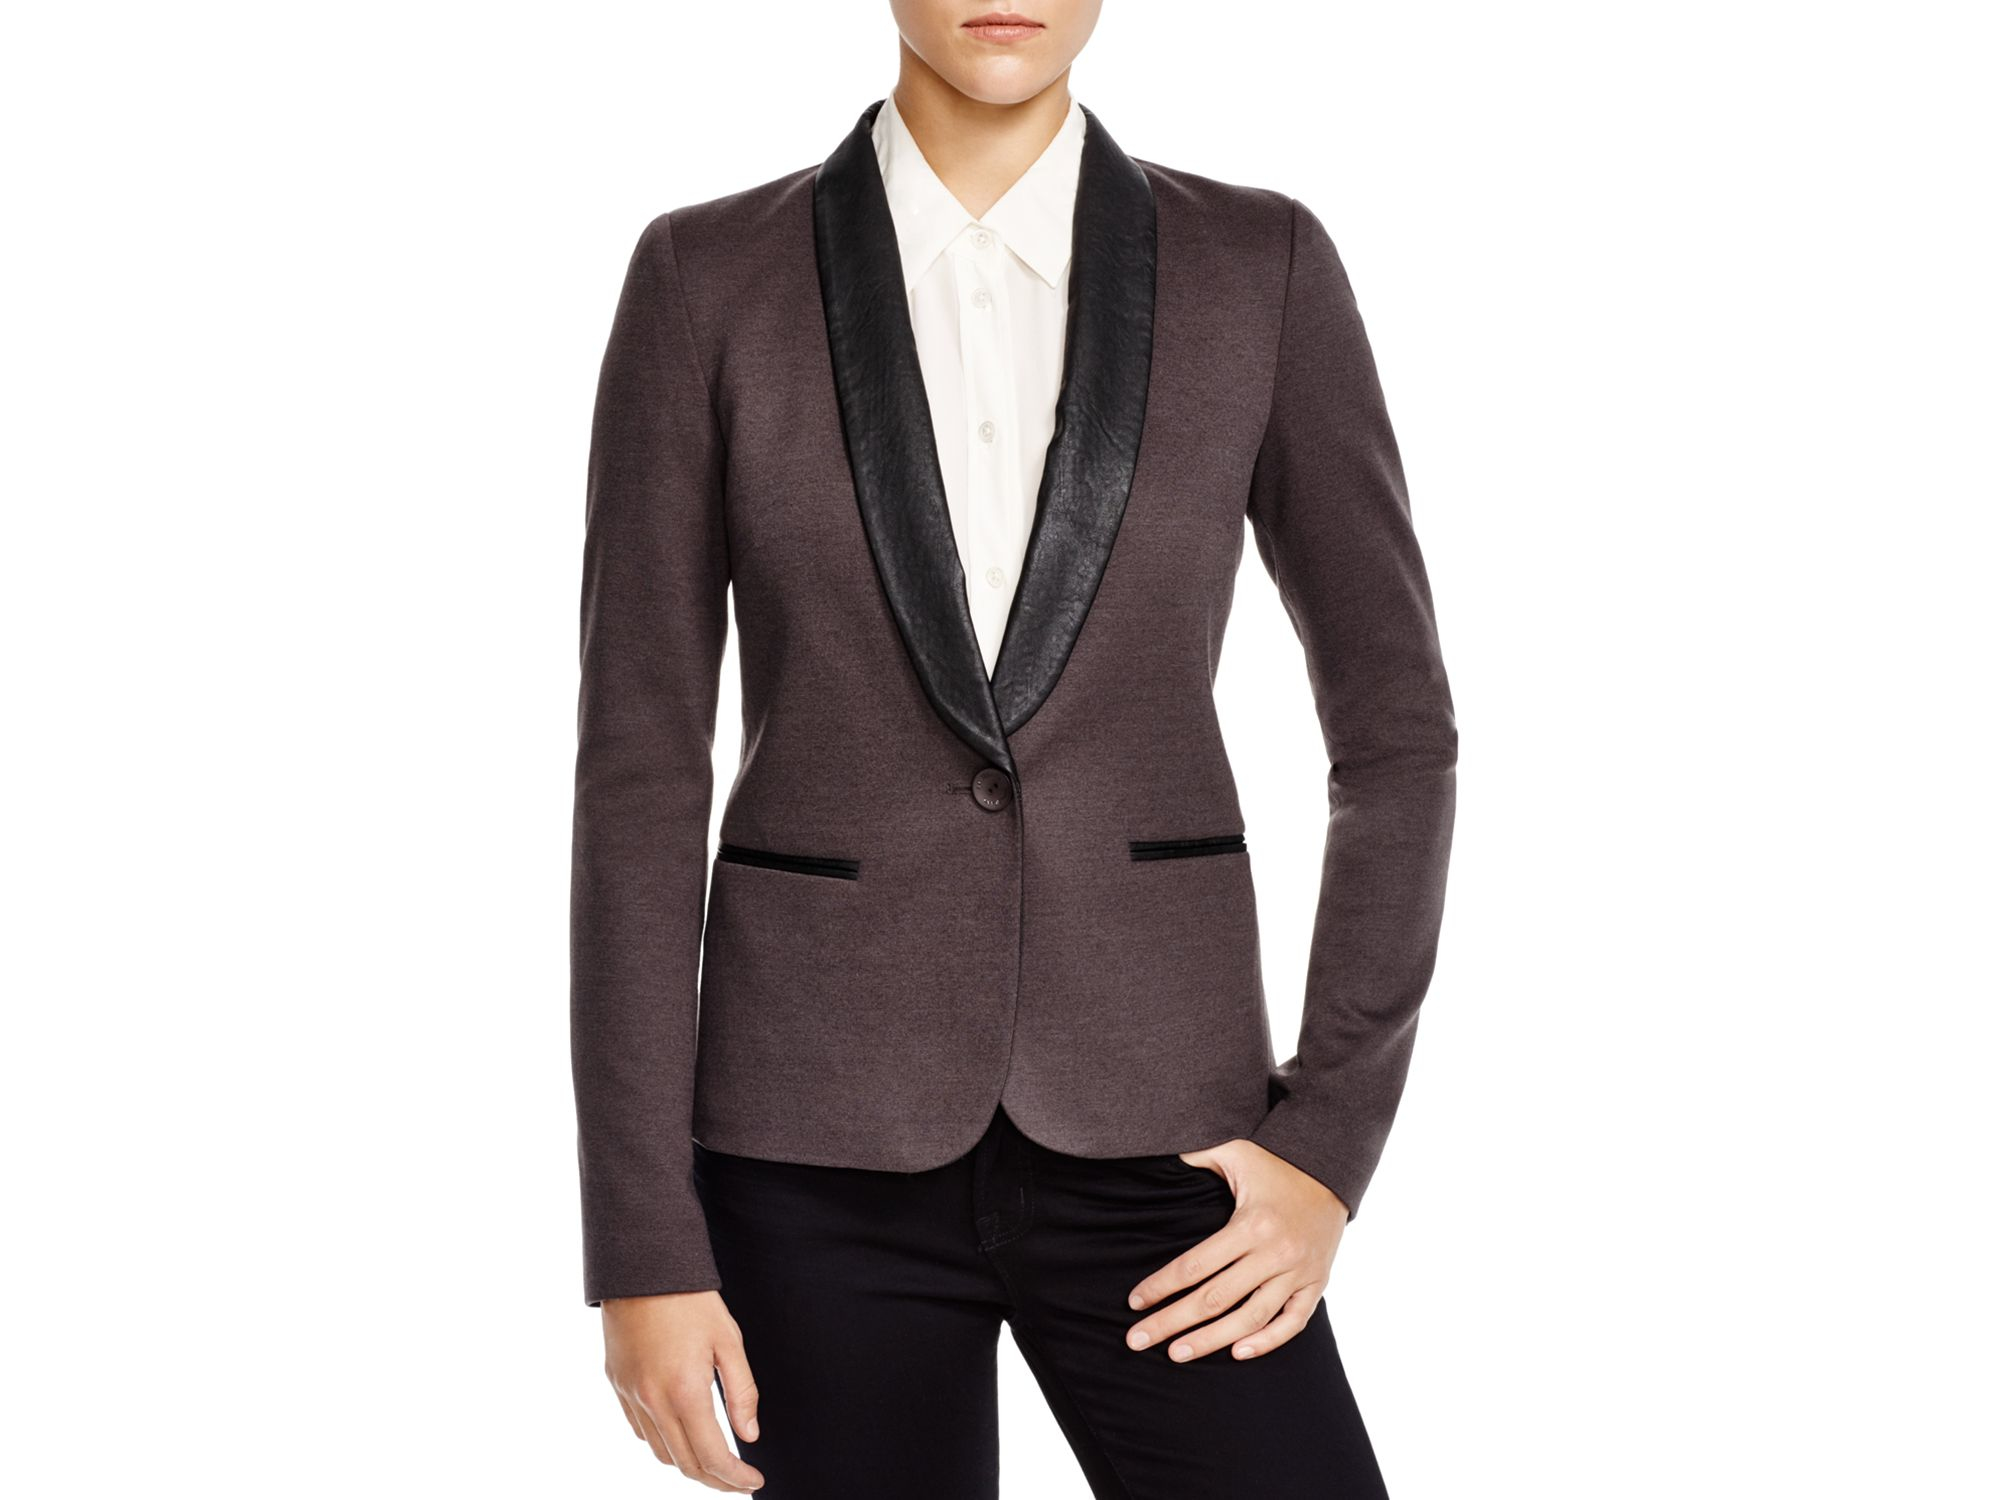 James jeans Tuxedo Jacket in Brown | Lyst